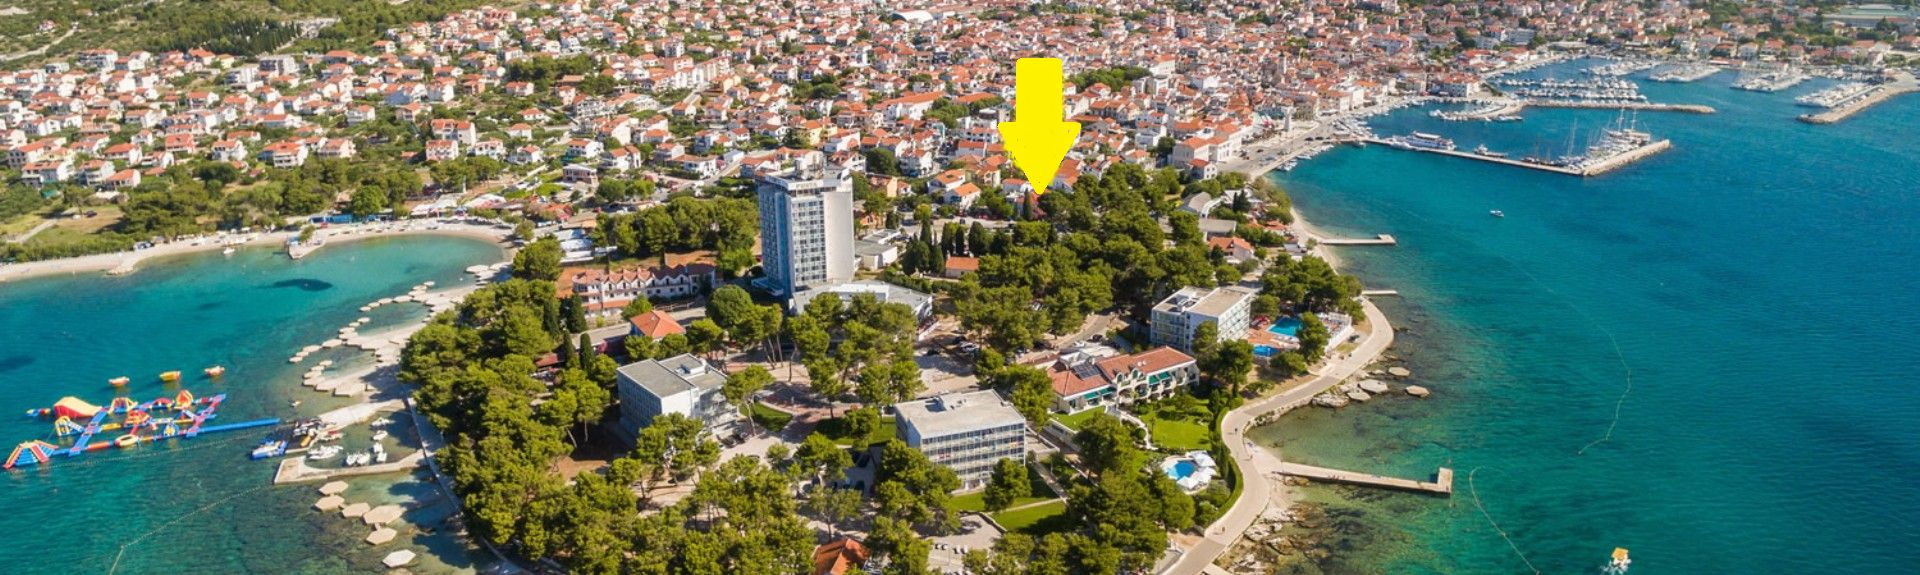 Tisno, Croatia